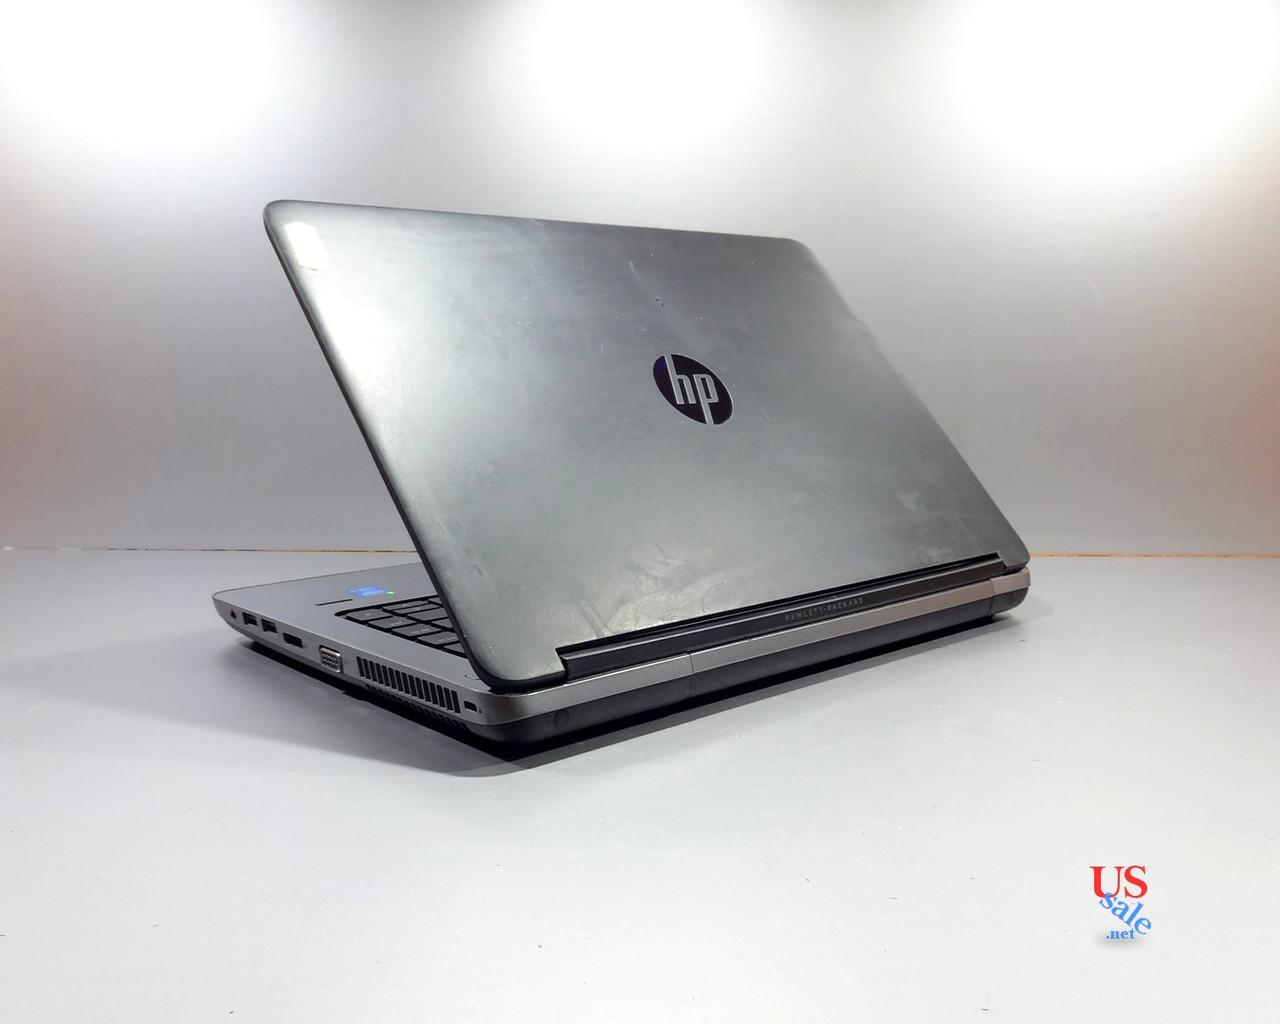 "Ноутбук HP ProBook 640 G1 14"", Intel Core i5-4200m 2.5 GHz, 4Gb DDR3, 500Gb. Гарантія!"